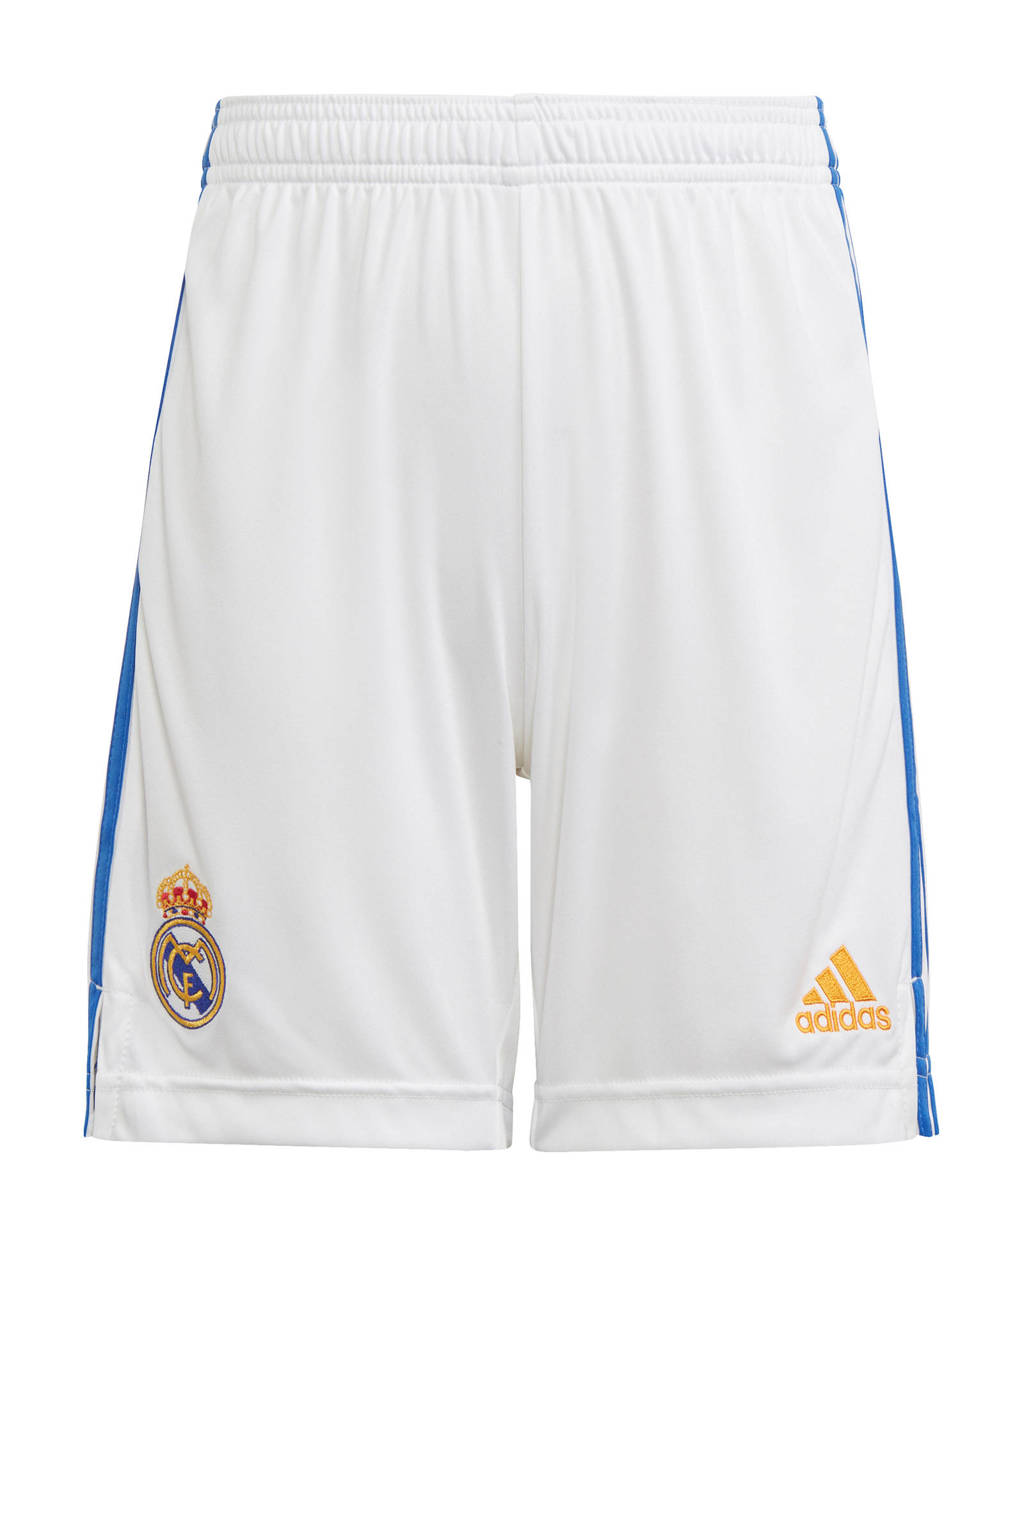 adidas Performance Junior Real Madrid voetbalshort thuis, Wit